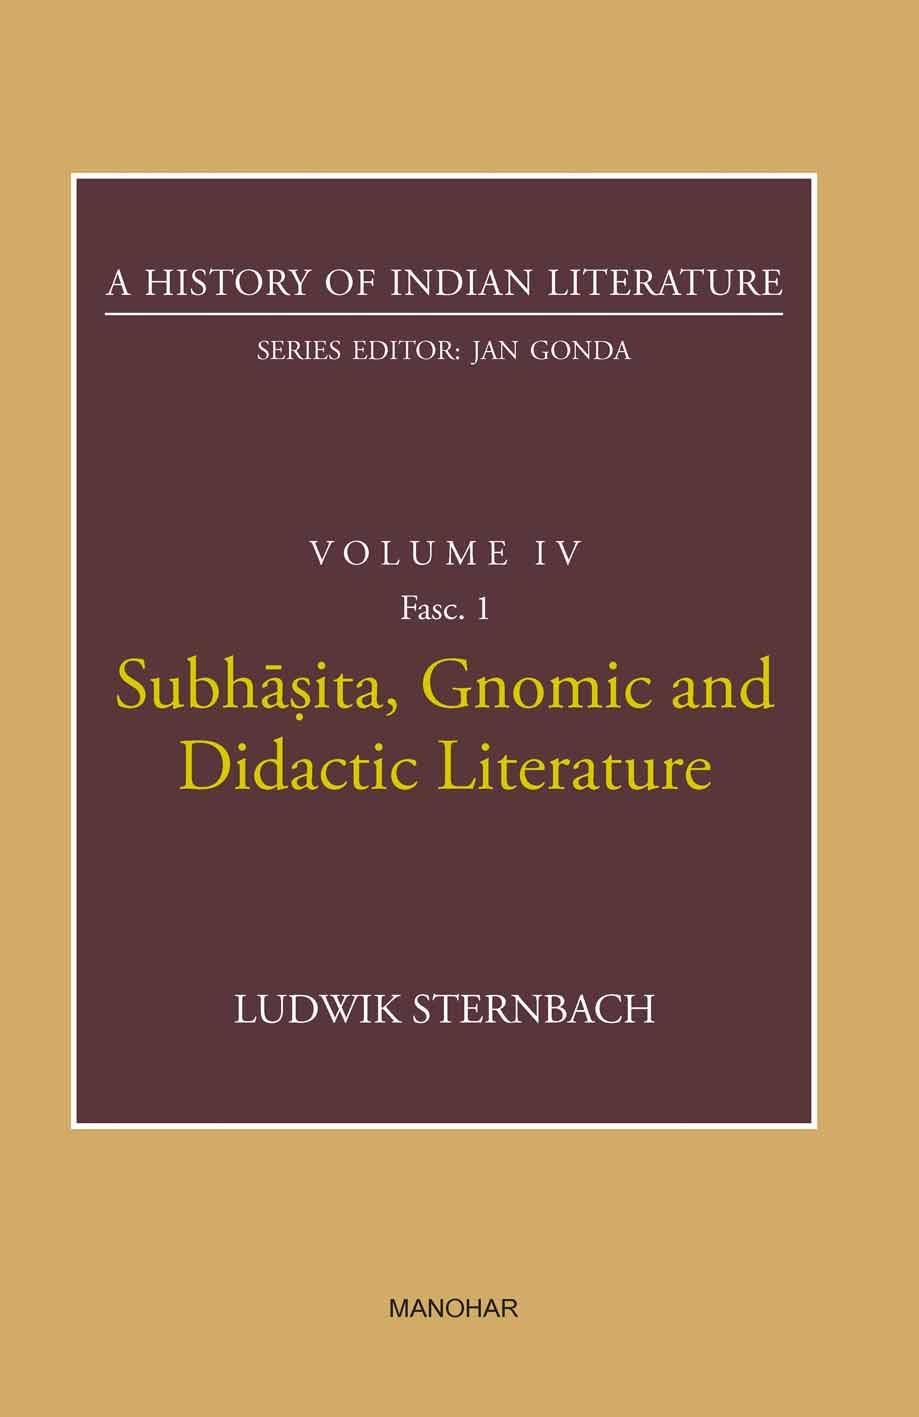 SUBHASITA, GNOMIC AND DIDACTIC LITERATURE (A HISTORY OF INDIAN LITERATURE, VOLUME 4, FASC. 1)